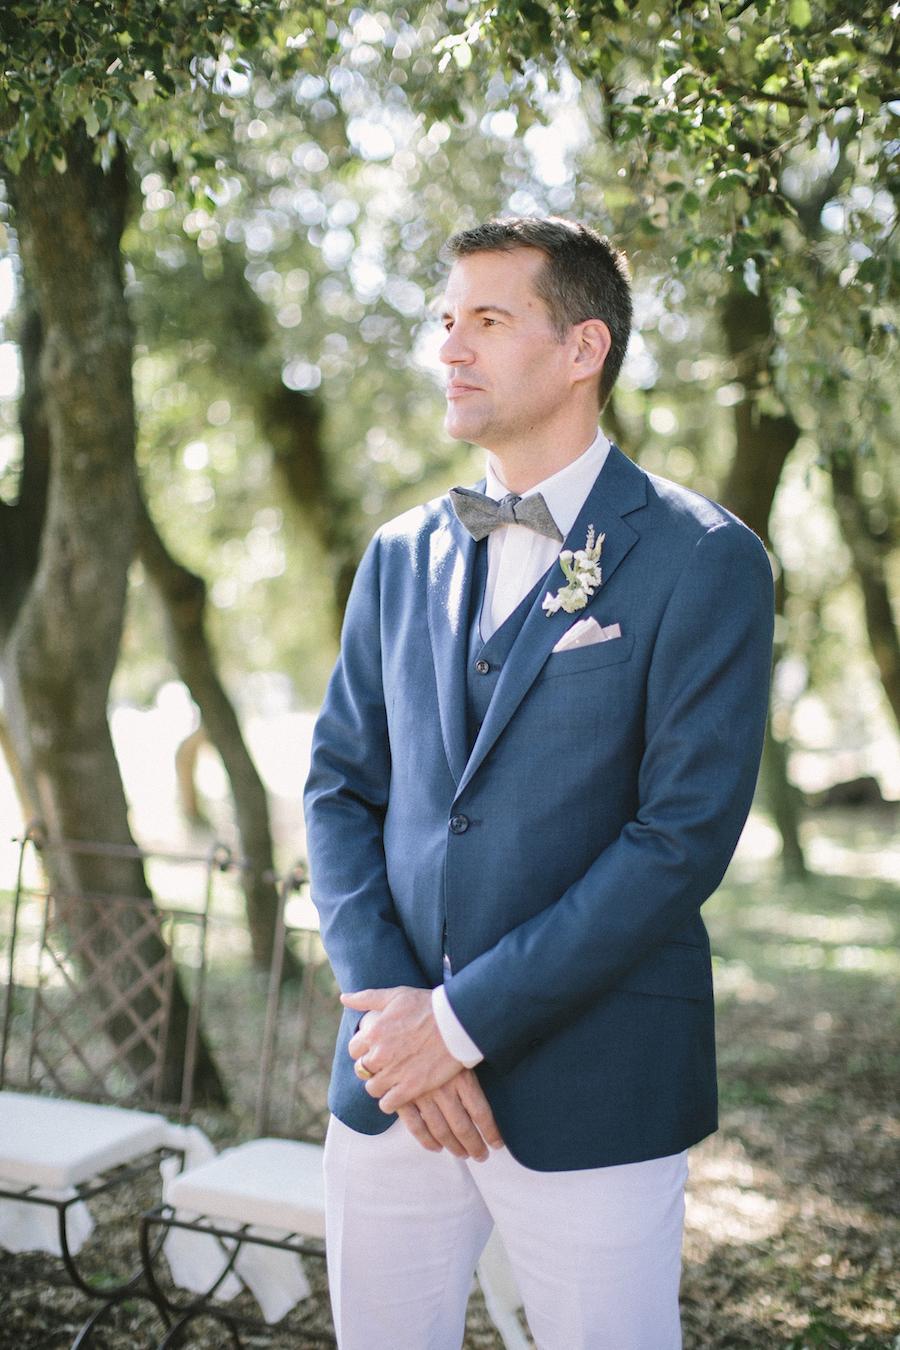 saya-photography-rustic-french-wedding-provence-domaines-de-patras-73.jpg